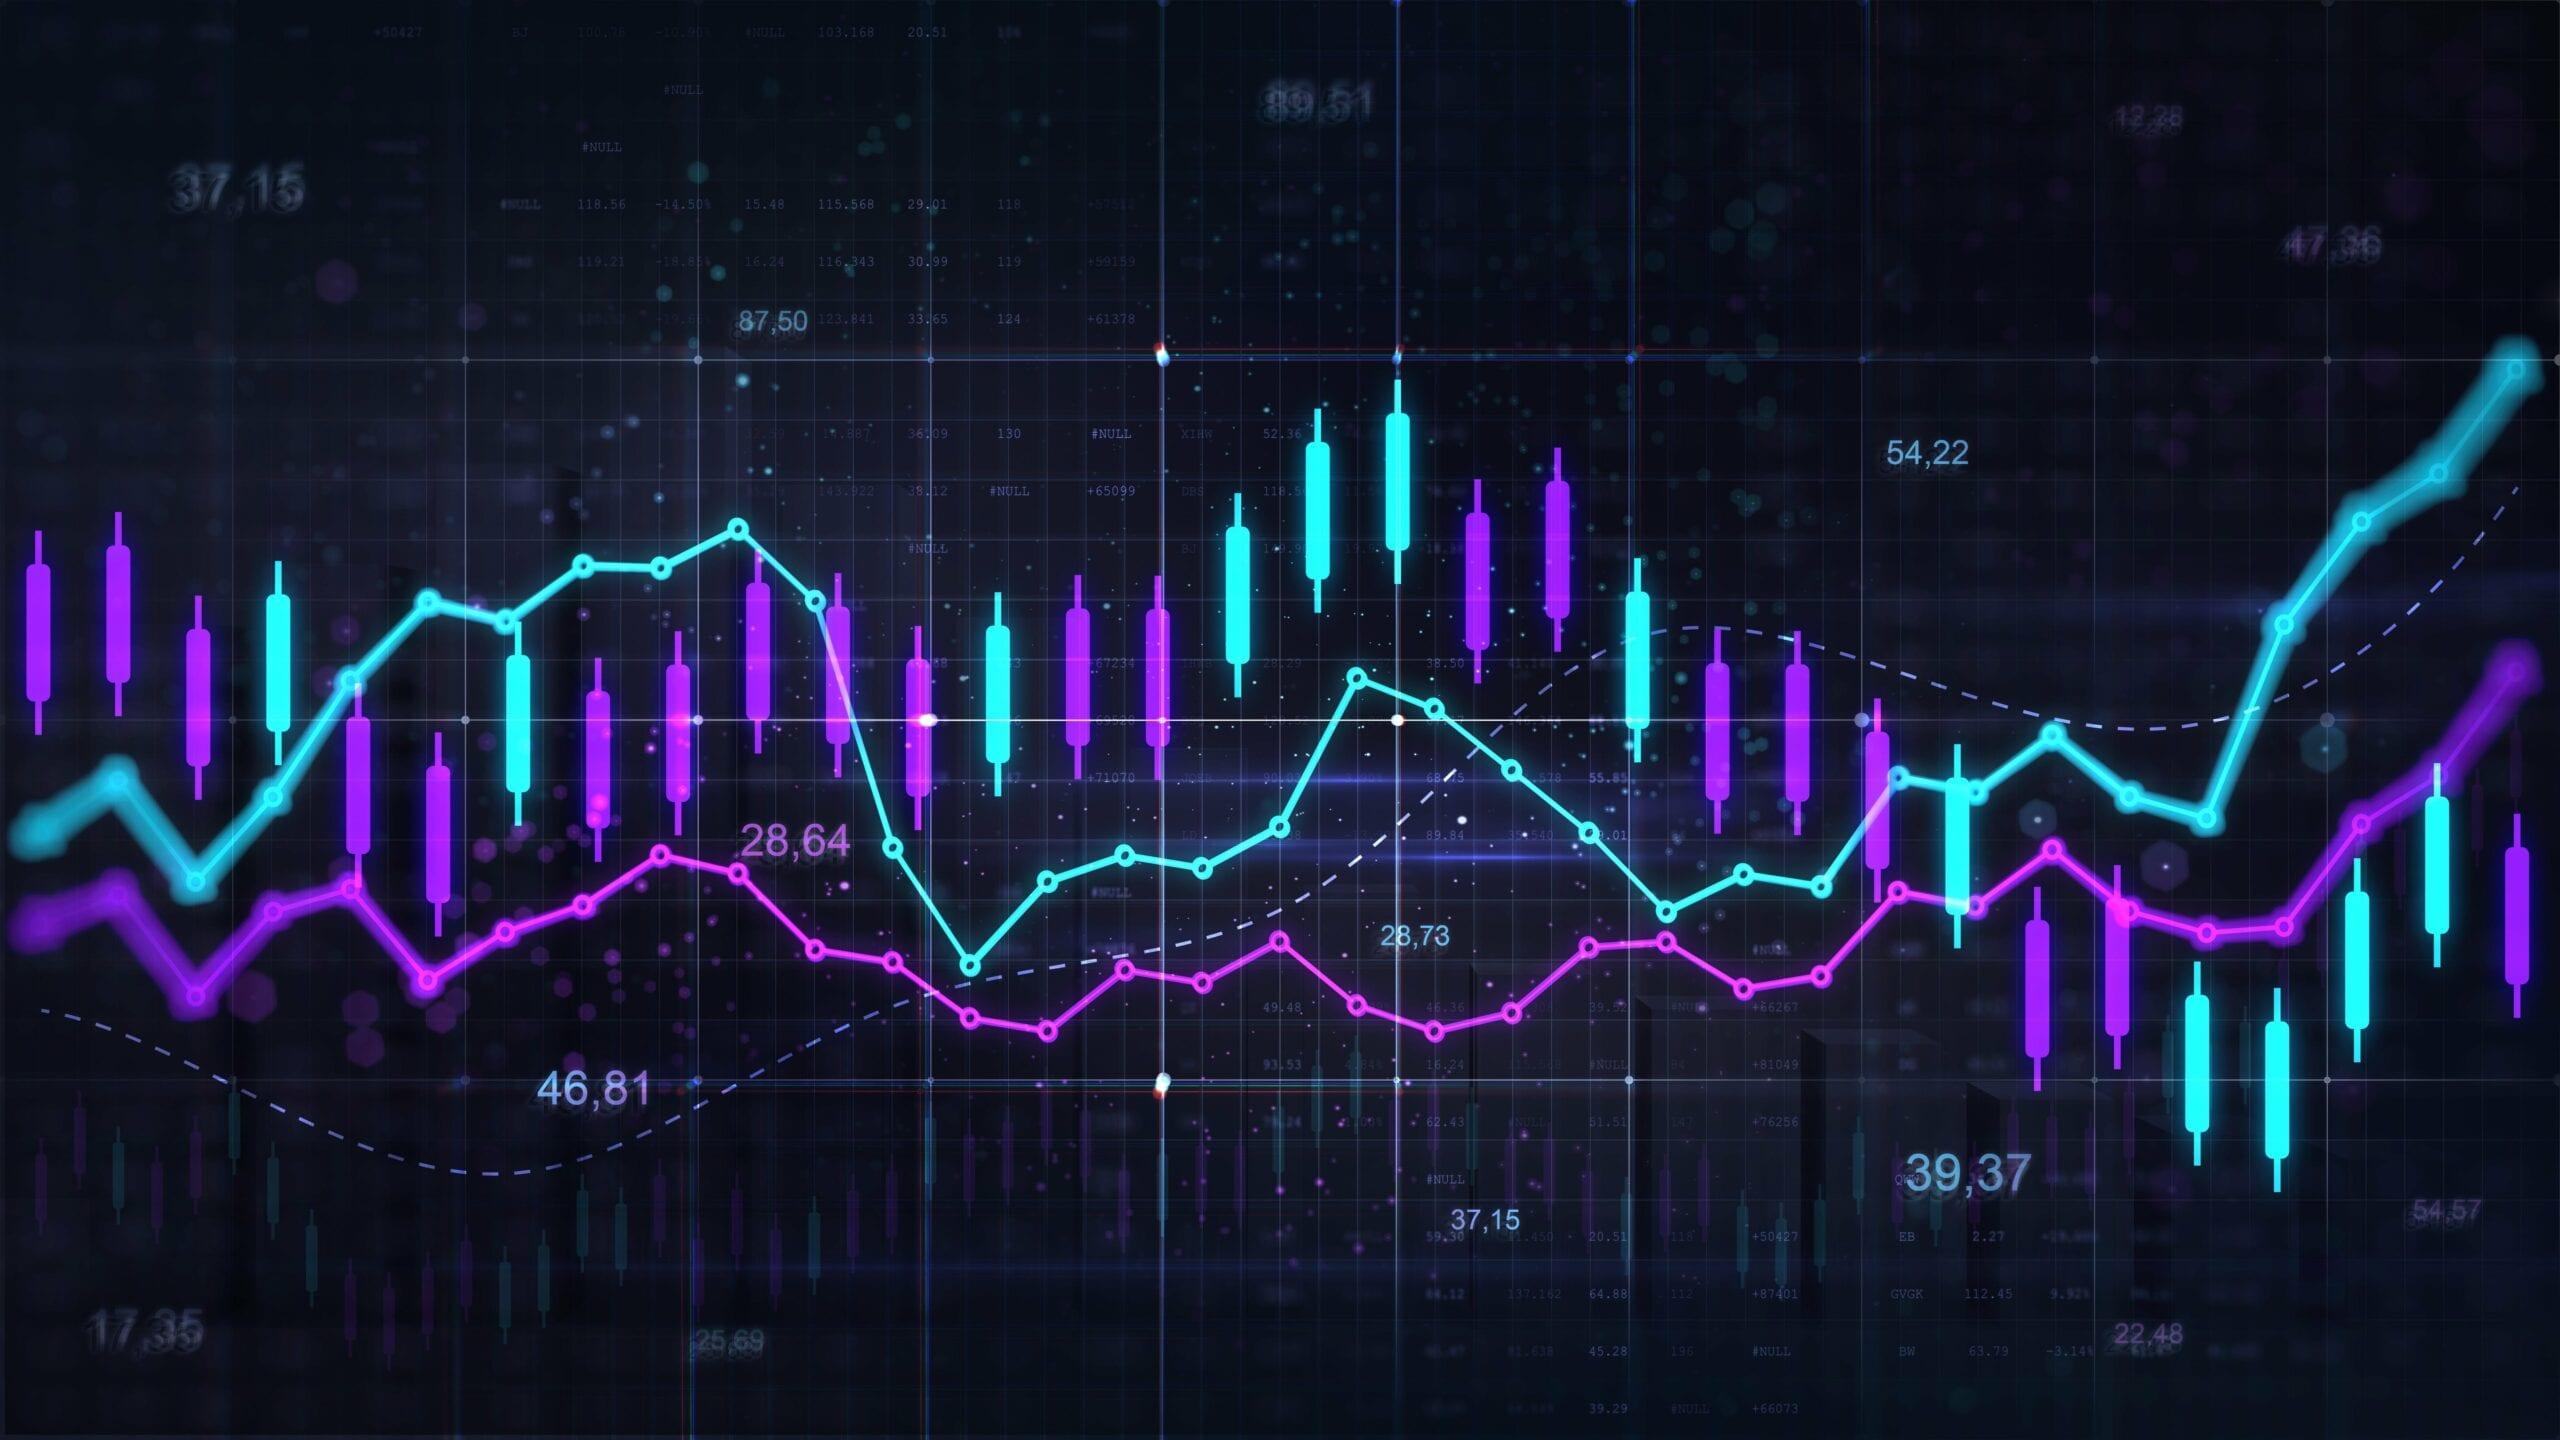 OHLC Price Chart